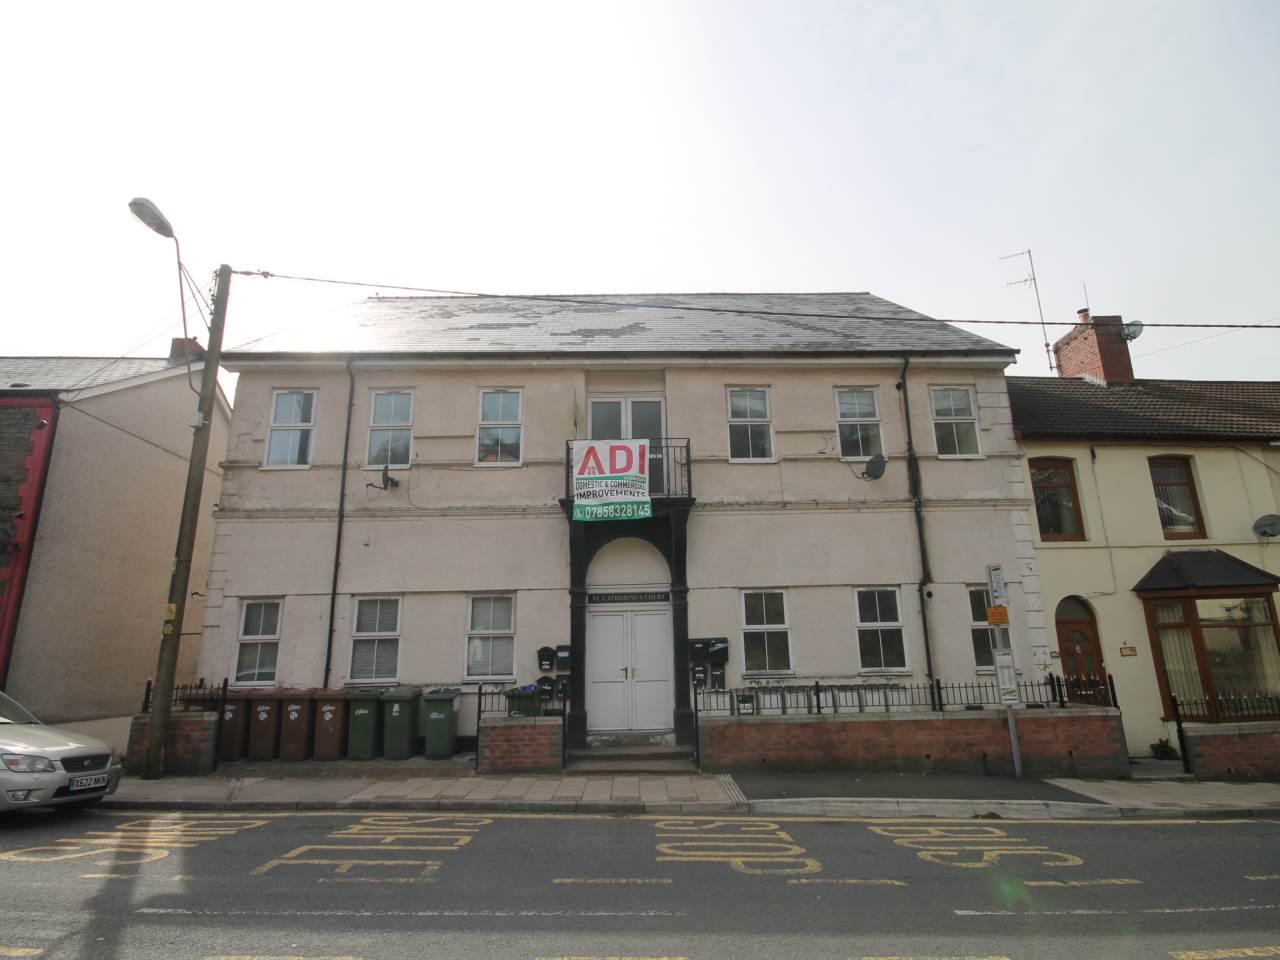 Flat H St Catherines Court, Senghenydd, Caerphilly, CF83 4FW